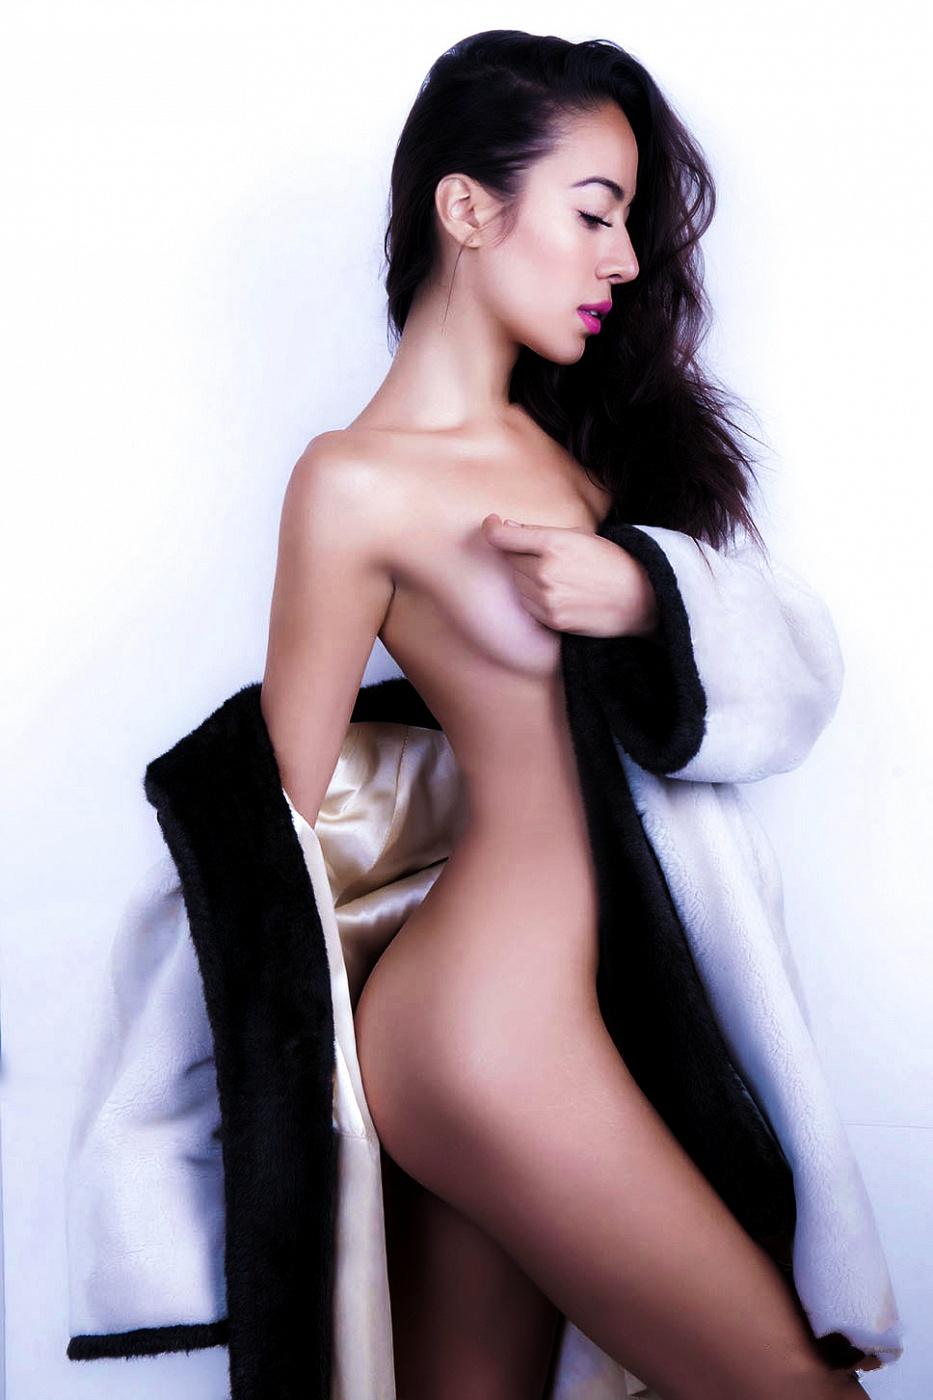 Giselle Valais